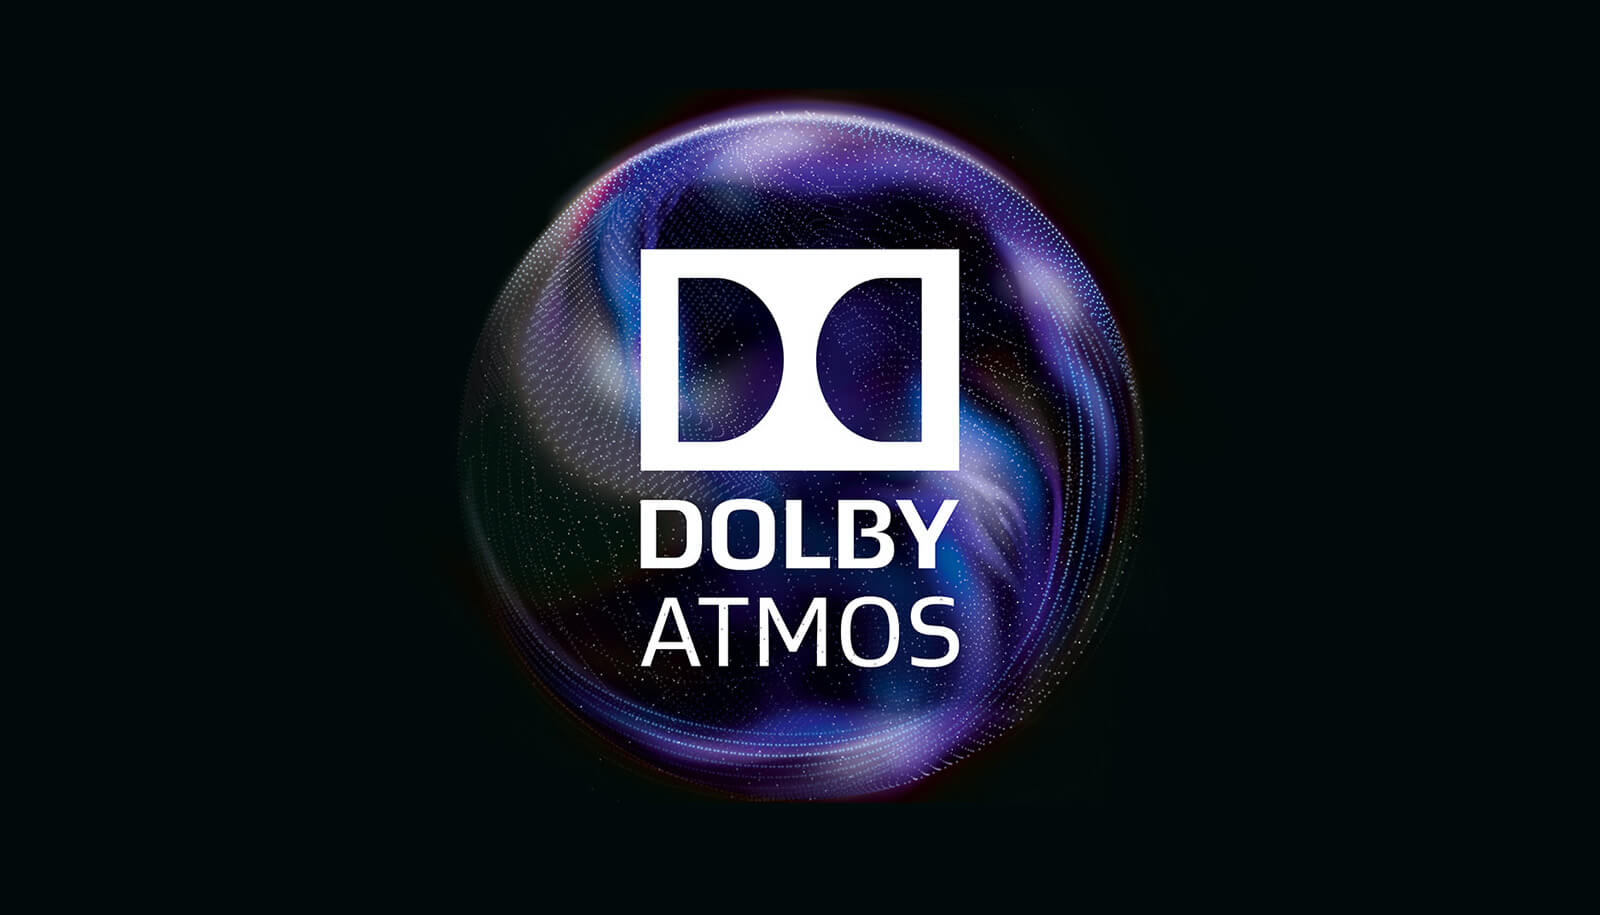 dolby digital dolby atmos packaging logo - purple